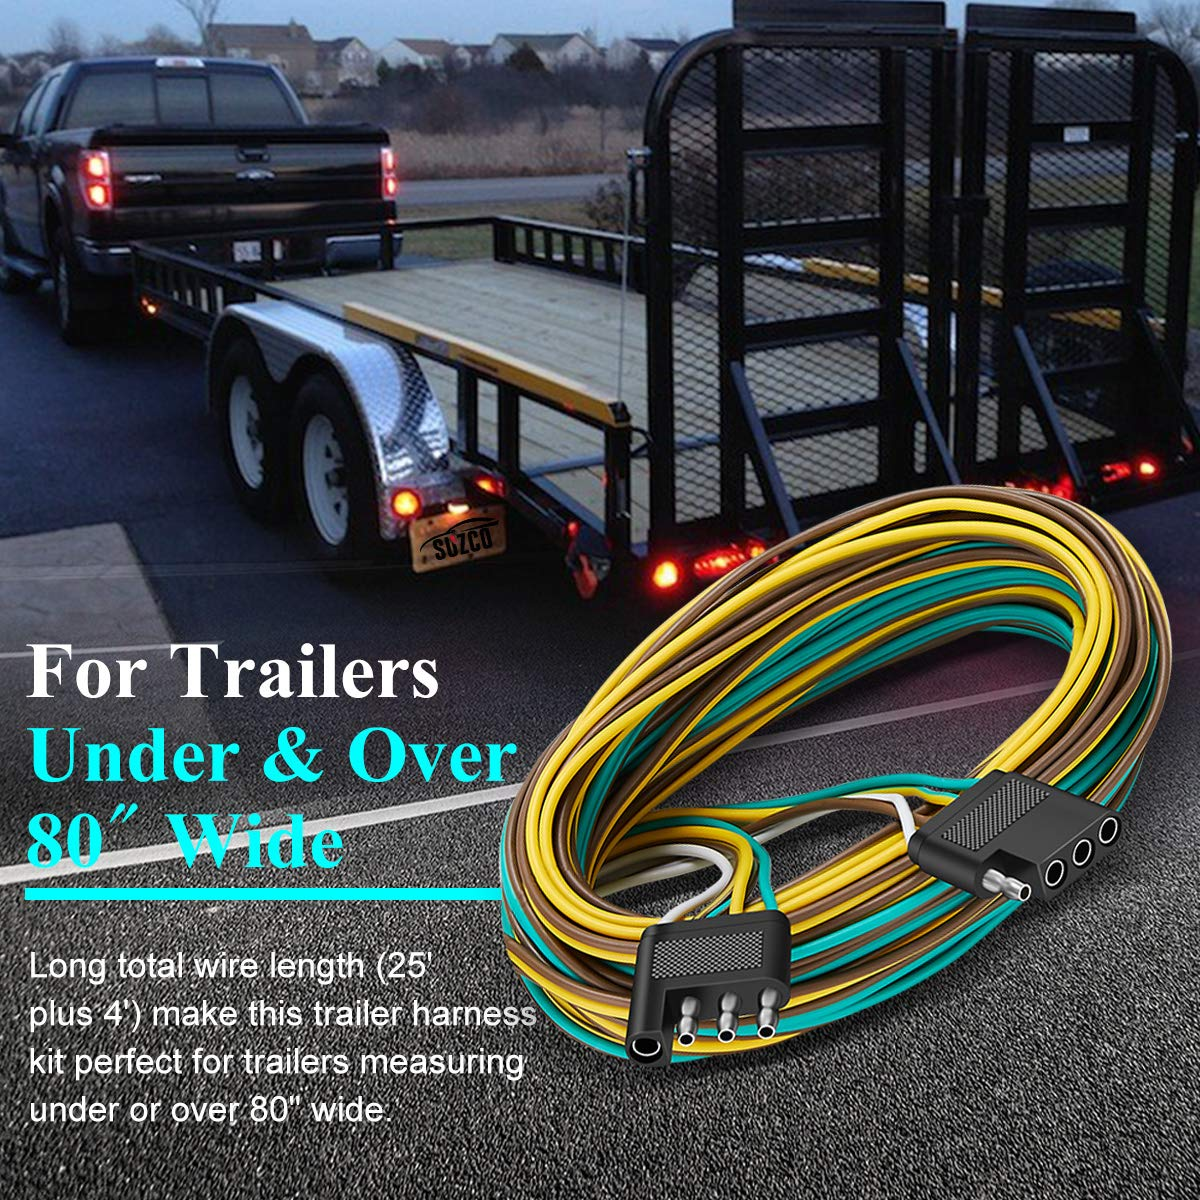 Trailer Light Wiring Harness Additionally 4 Wire Trailer Wiring